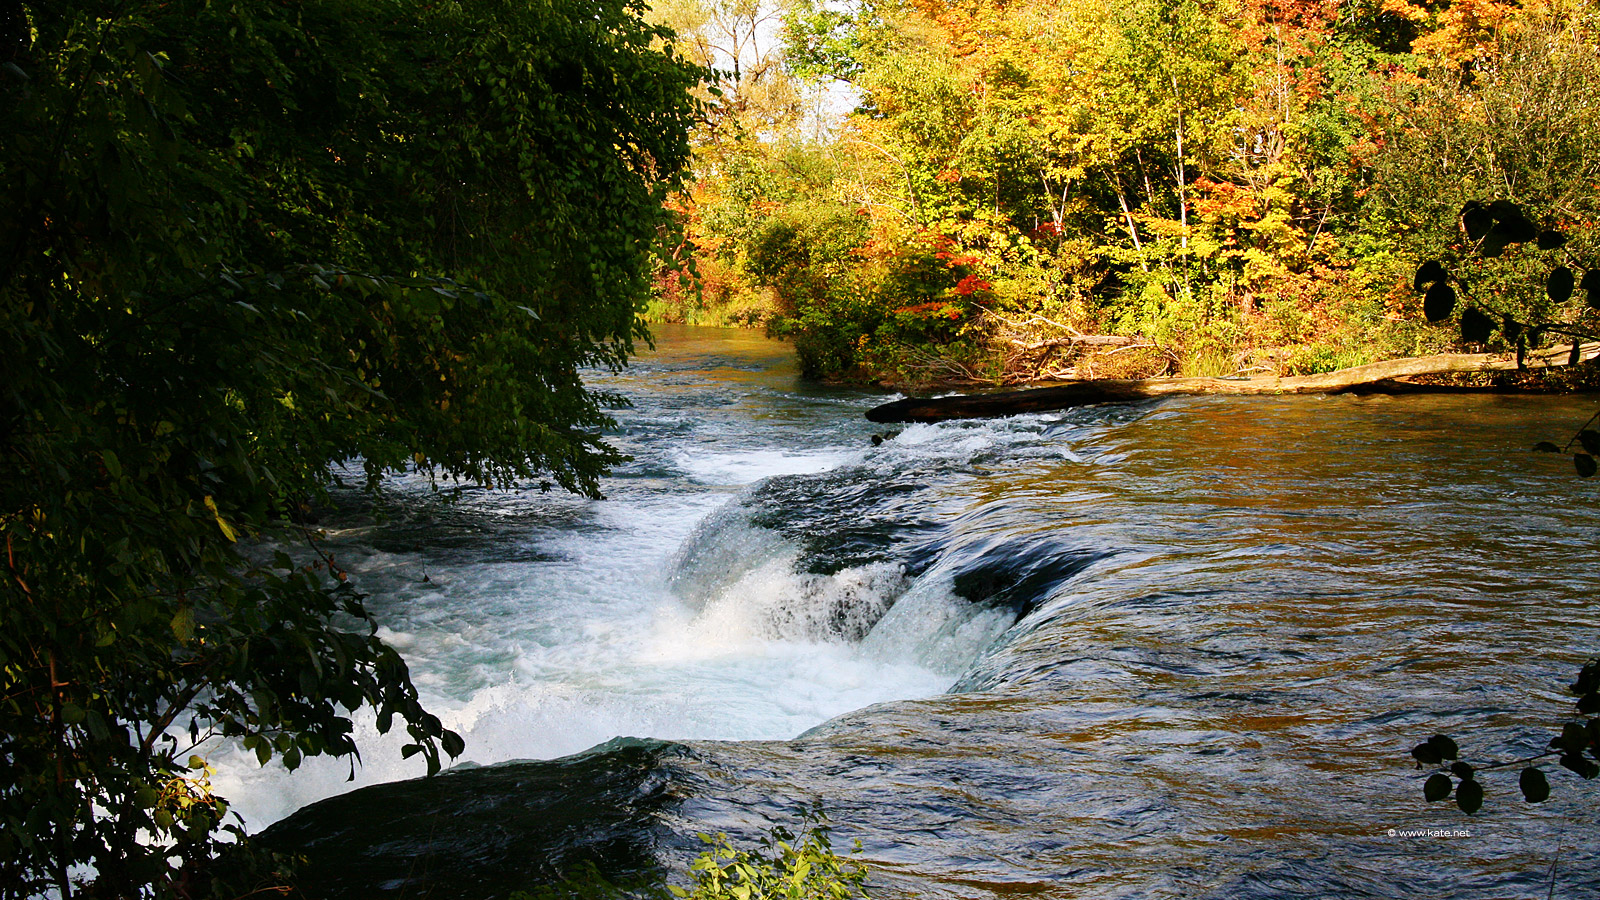 River in Autumn 1600x900